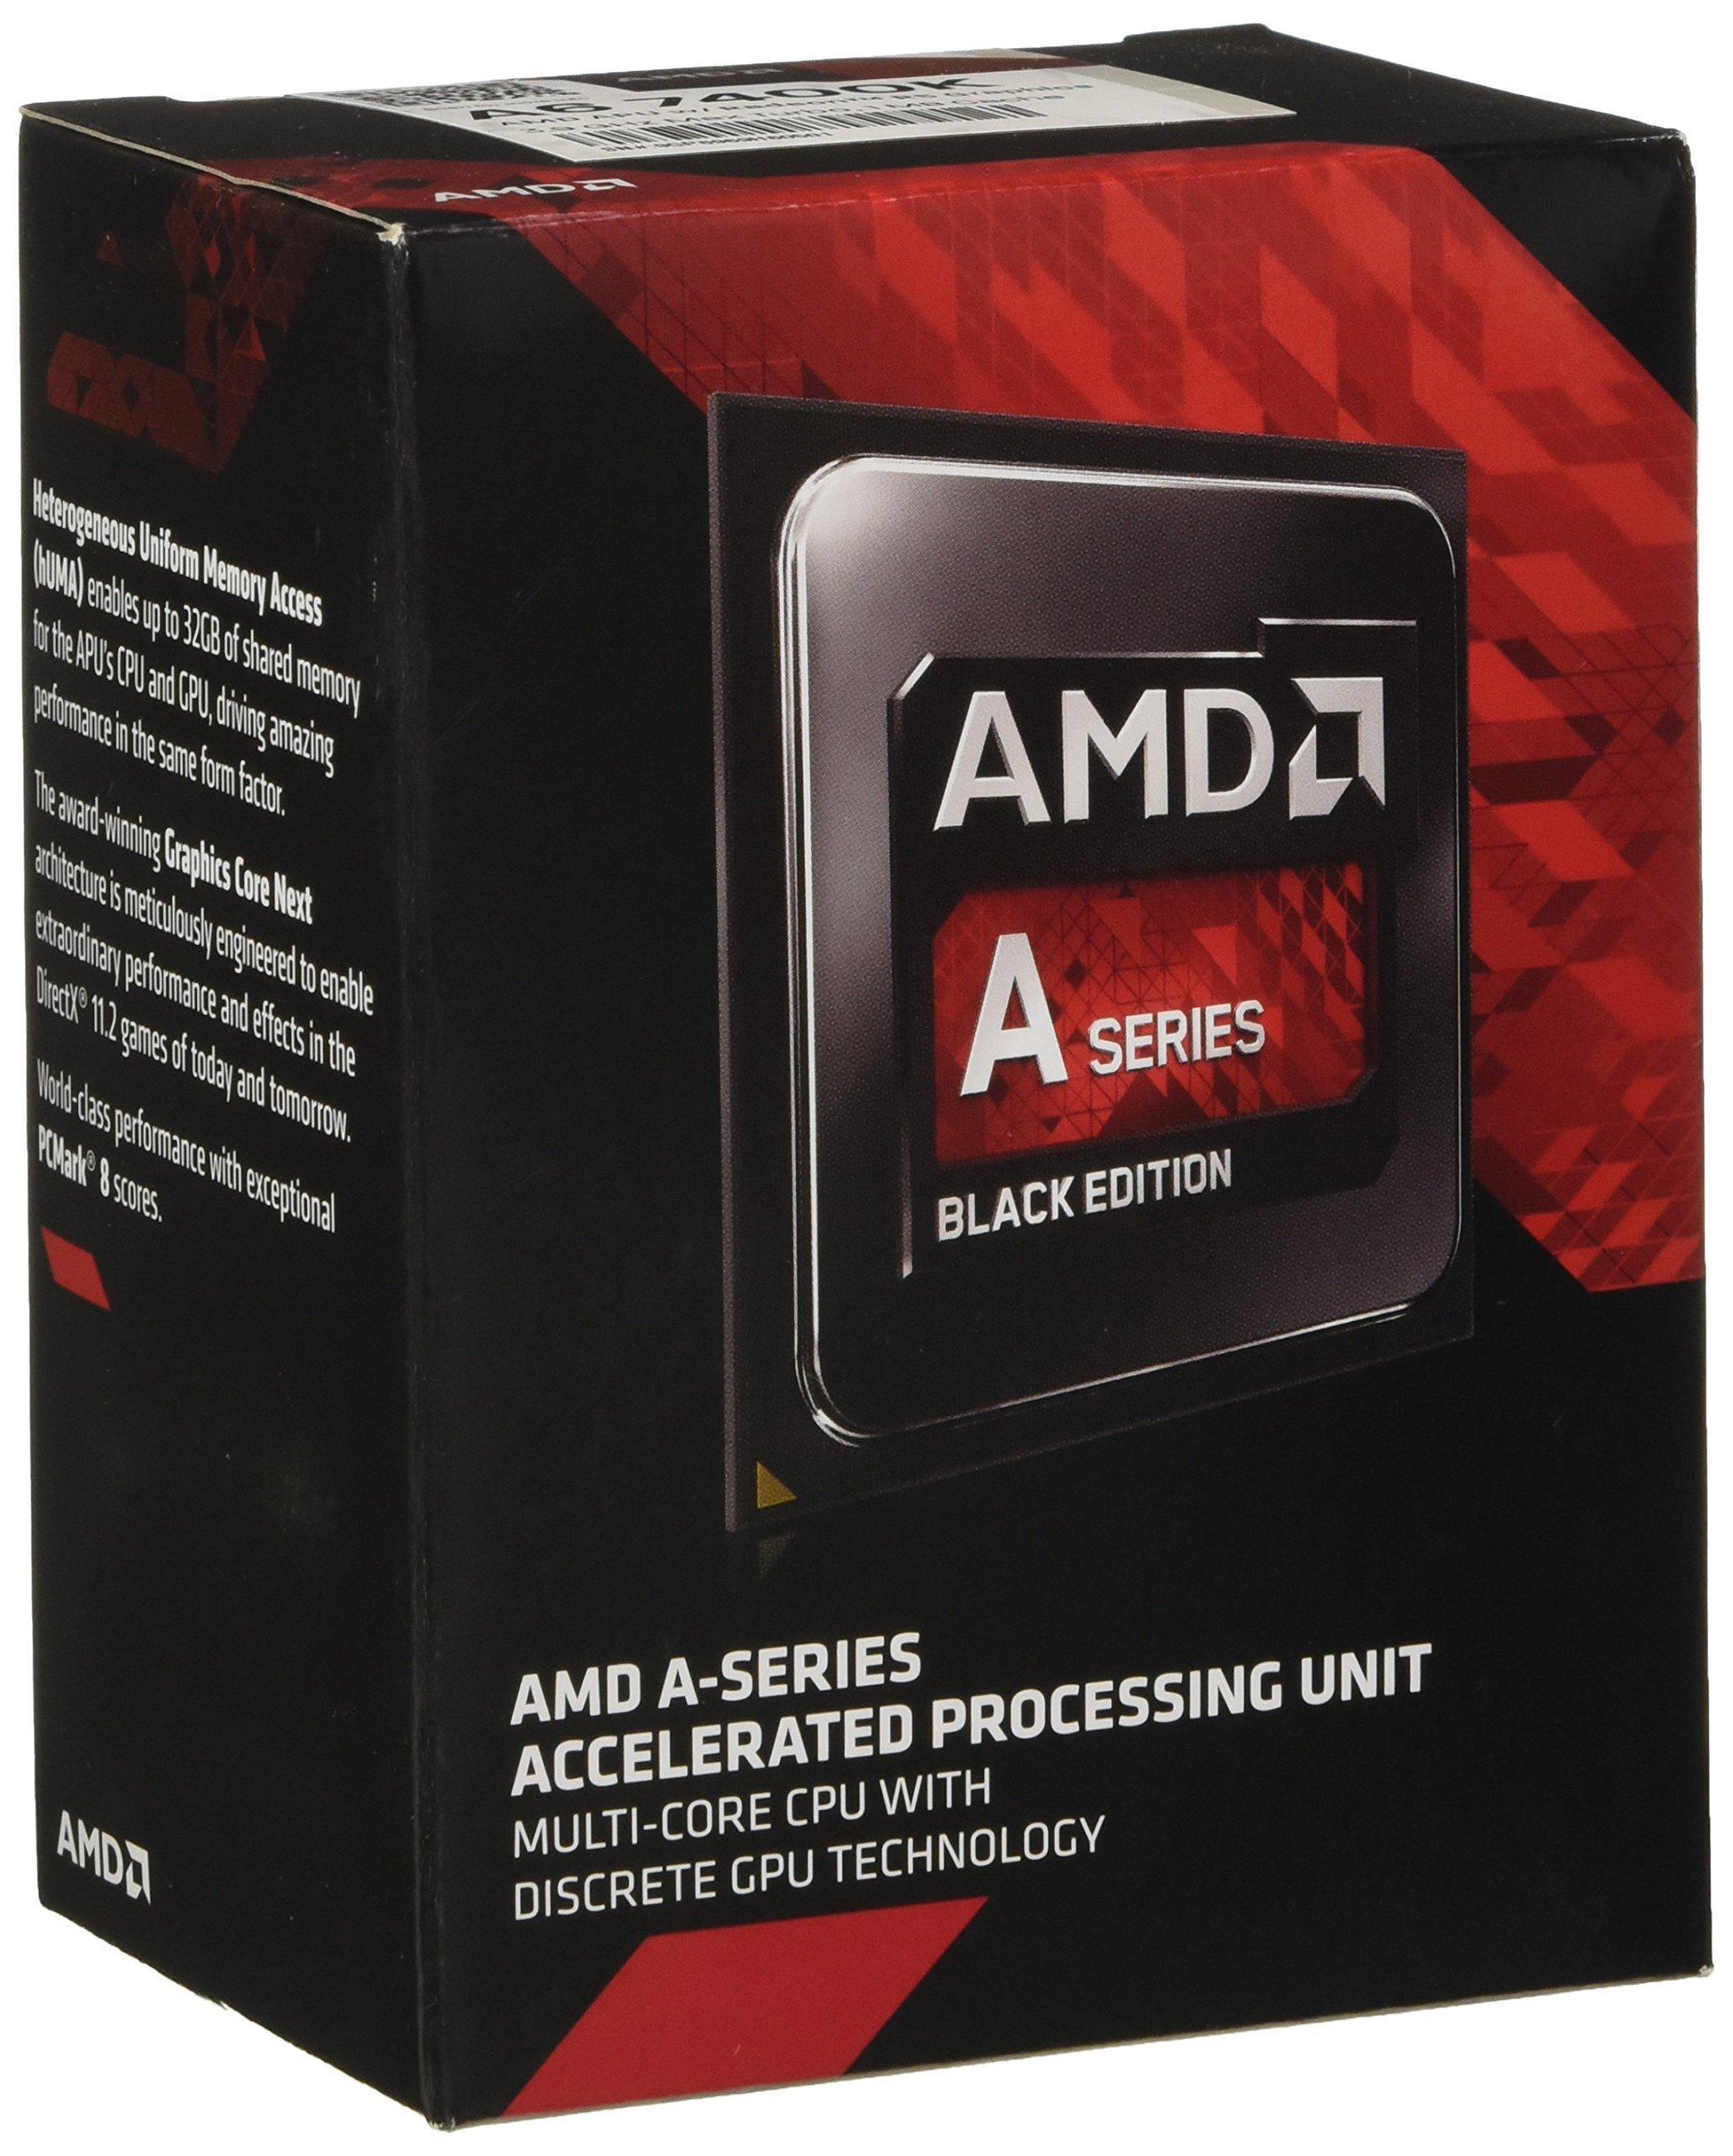 Amd Fm2 Socket Processors Karmashares Llc Leveraging Prosesor A4 5300 Trinity A6 7400k Dual Core 35 Ghz Desktop Processor Radeon R5